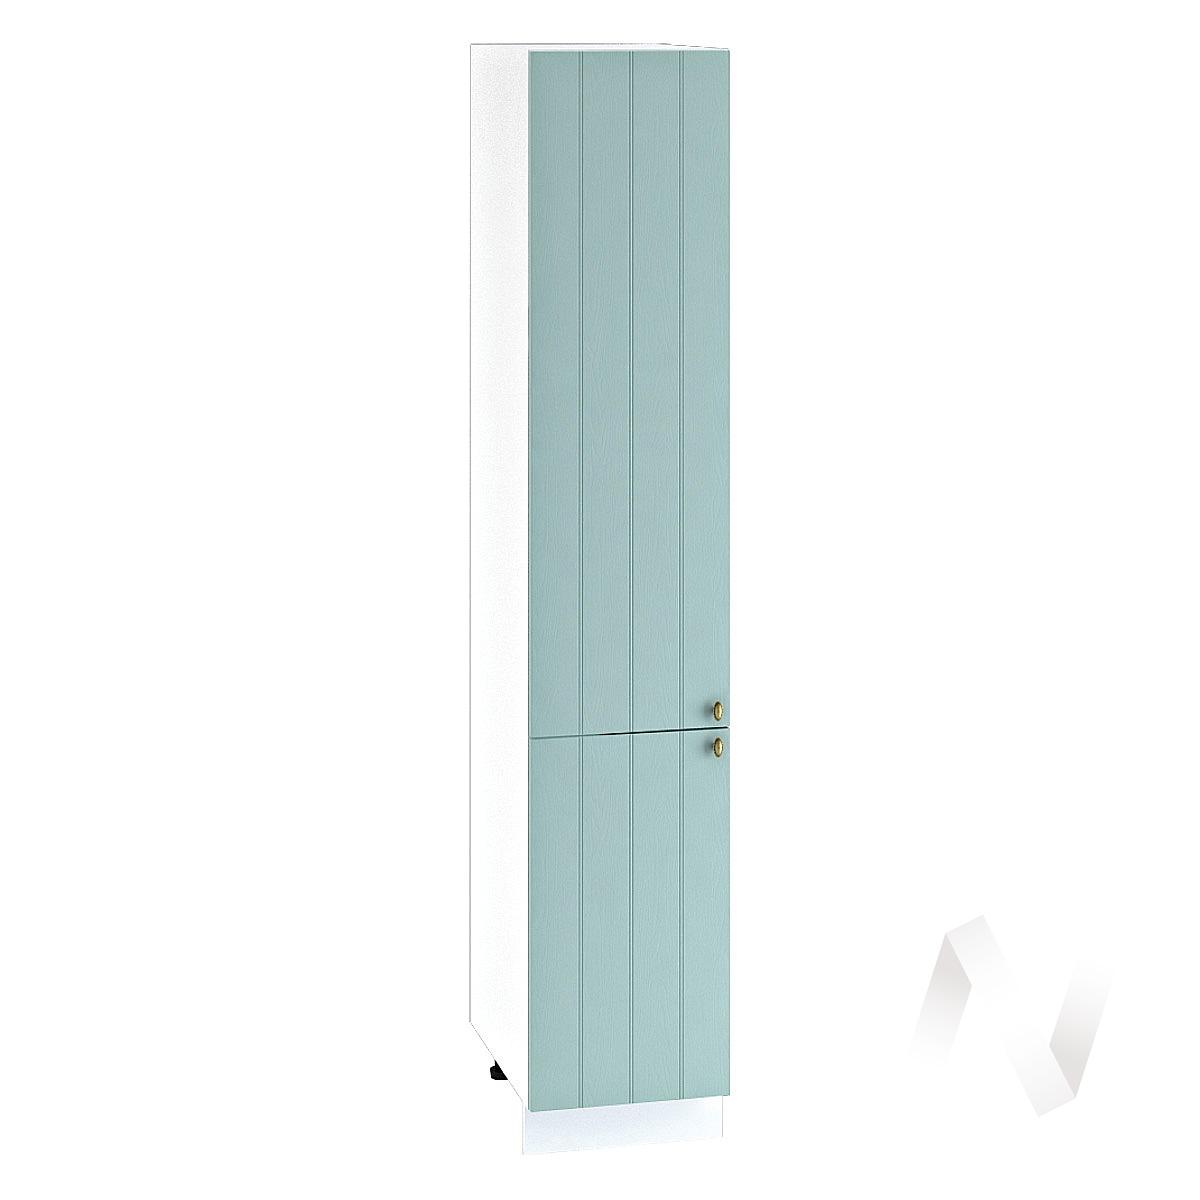 "Кухня ""Прованс"": Шкаф пенал 400, ШП 400 (голубой/корпус белый)"